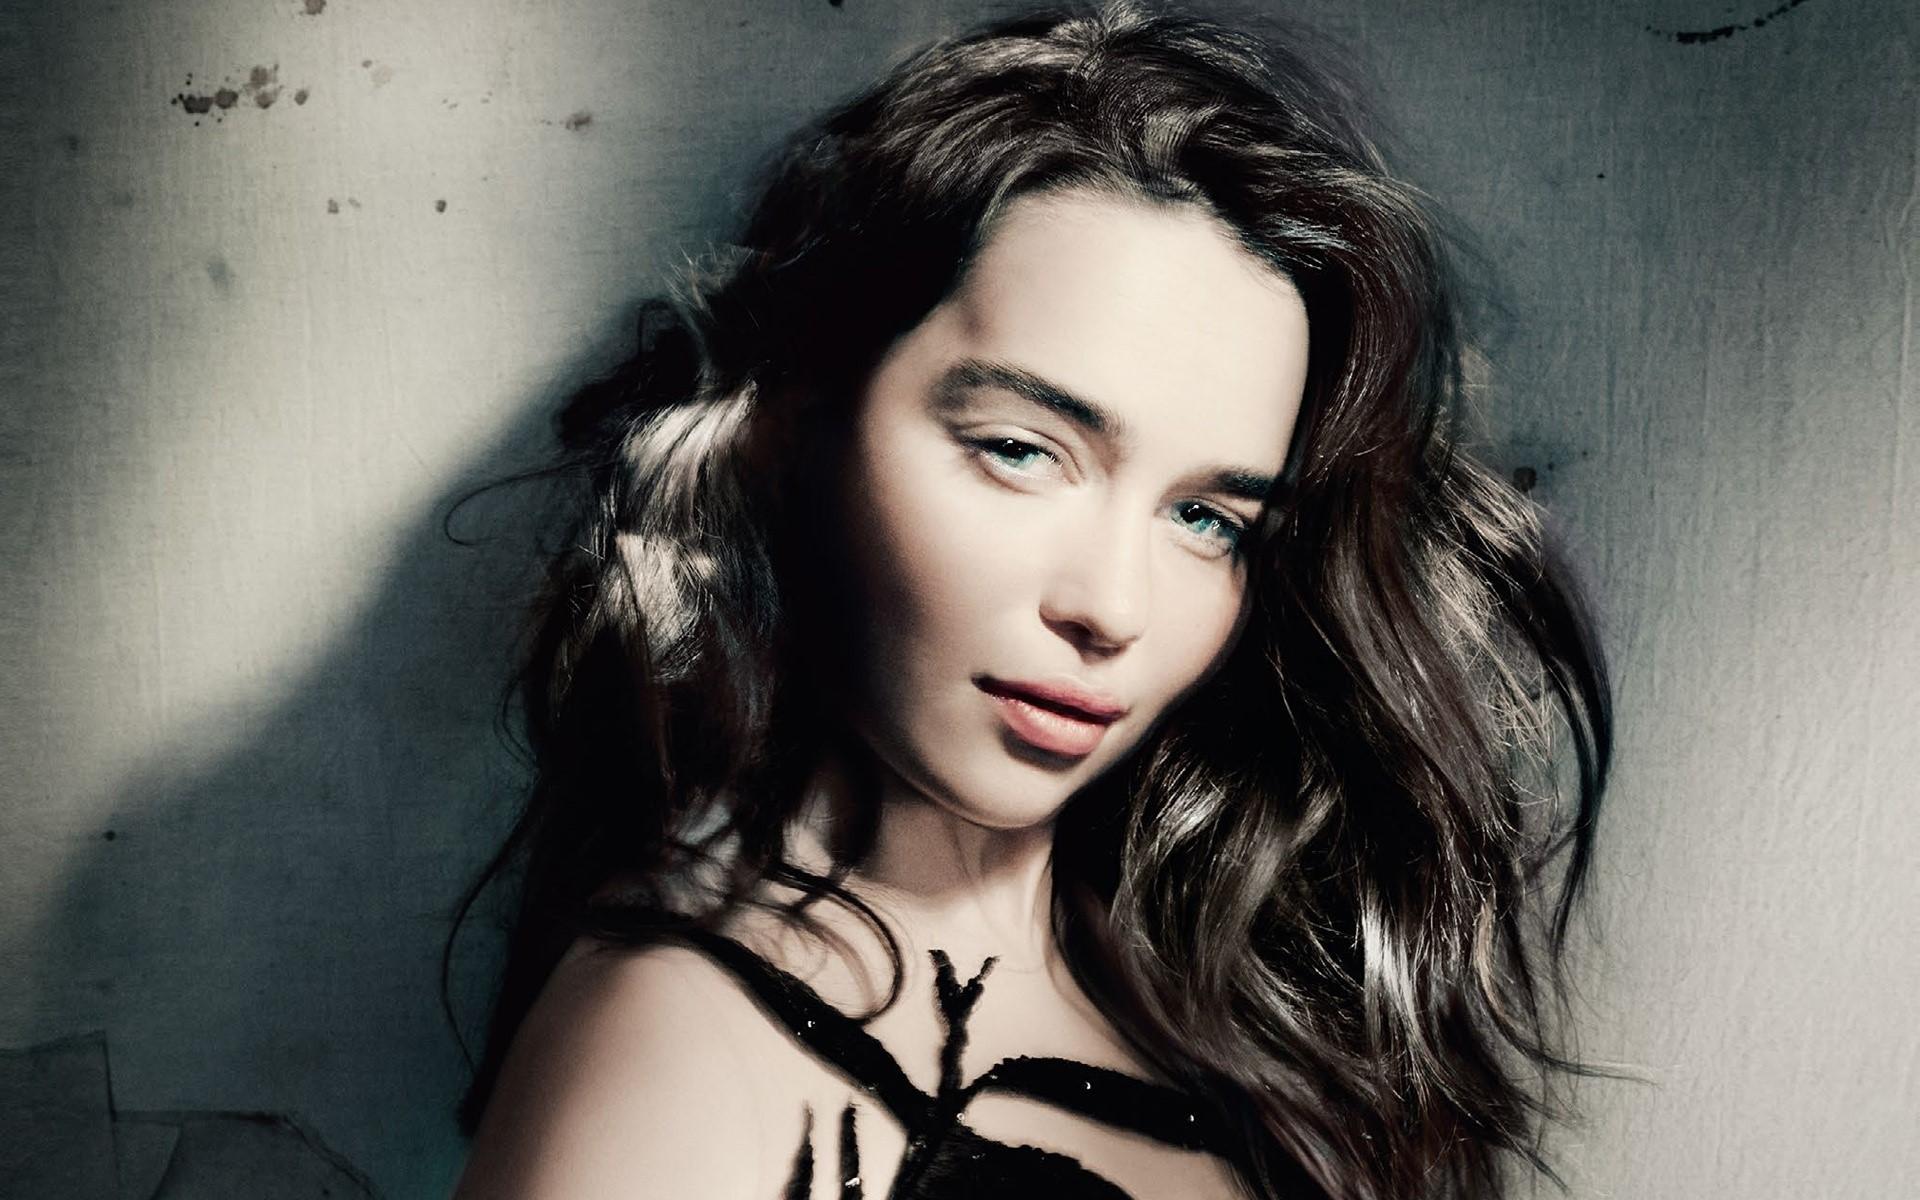 Wallpaper Emilia Clarke chestnut